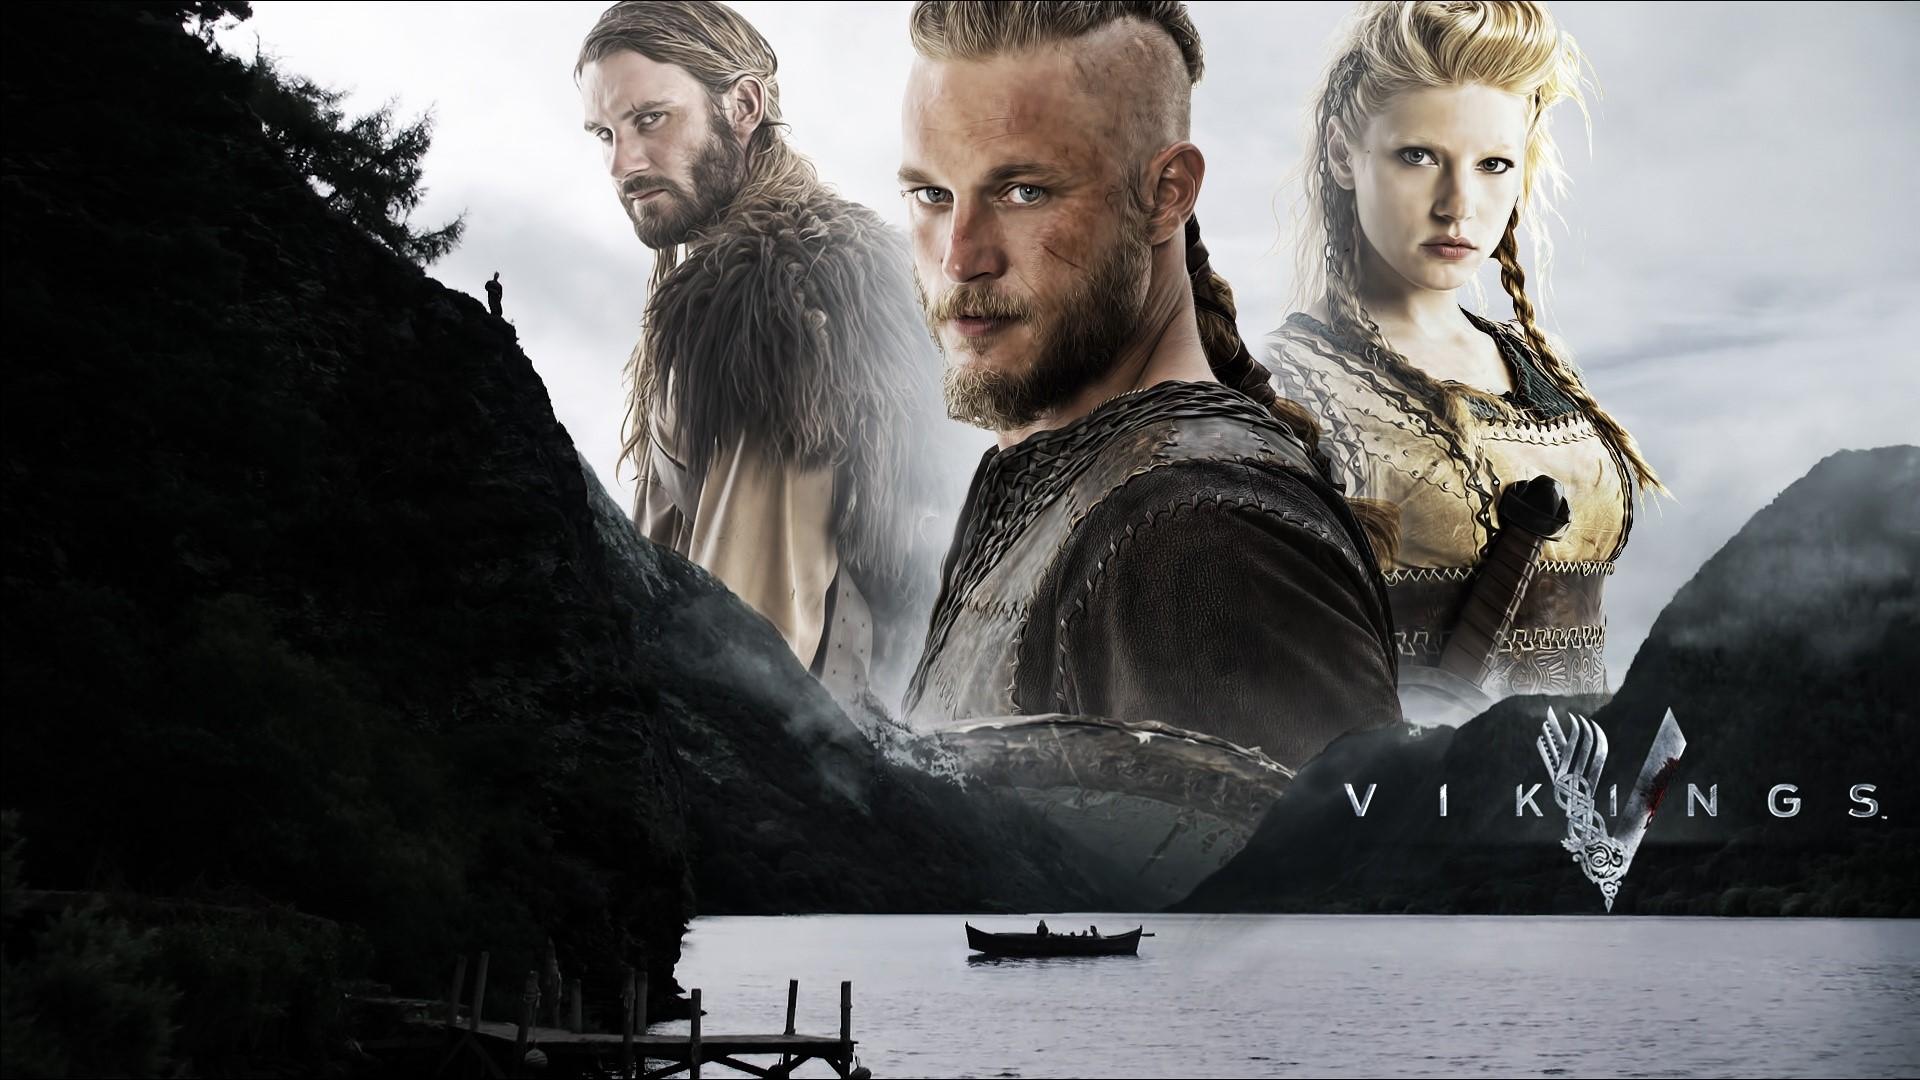 Vikings Tablet Wallpaper